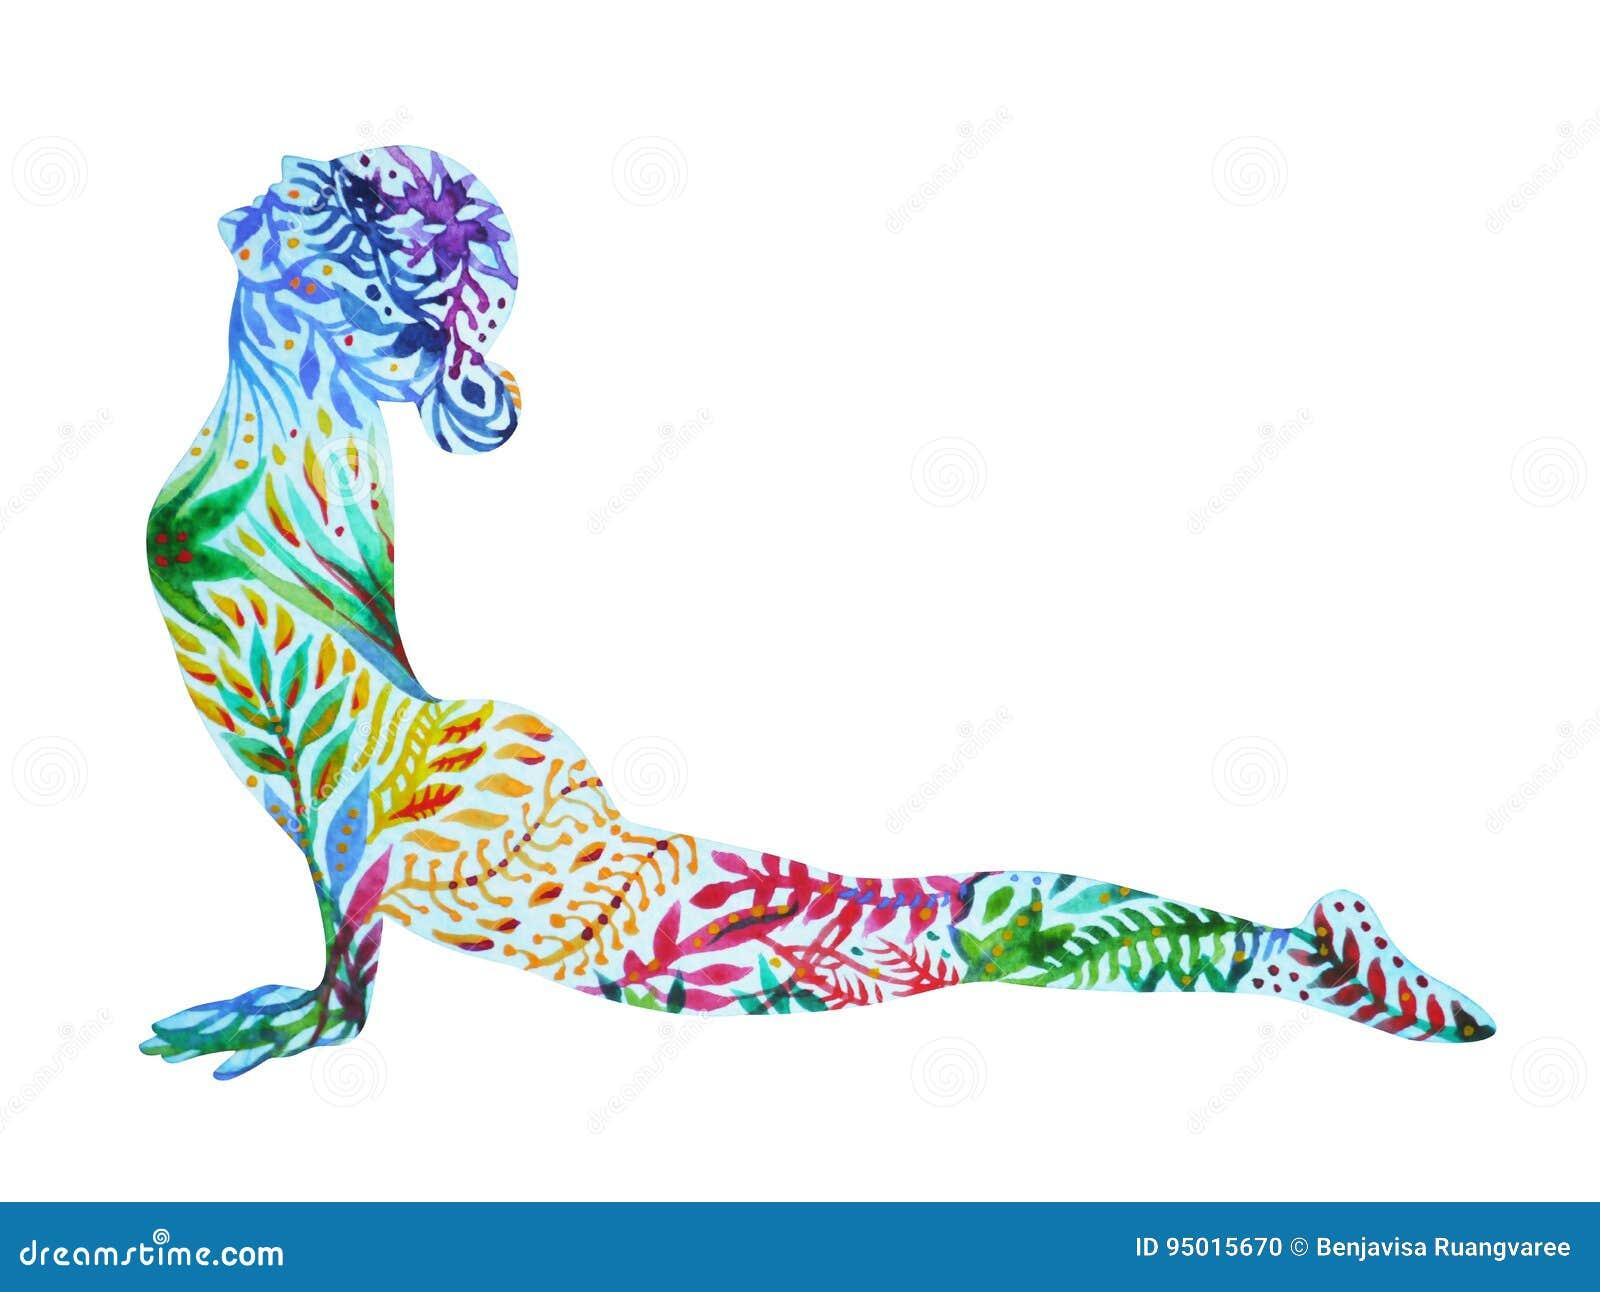 rainbow cartoons illustrations amp vector stock images